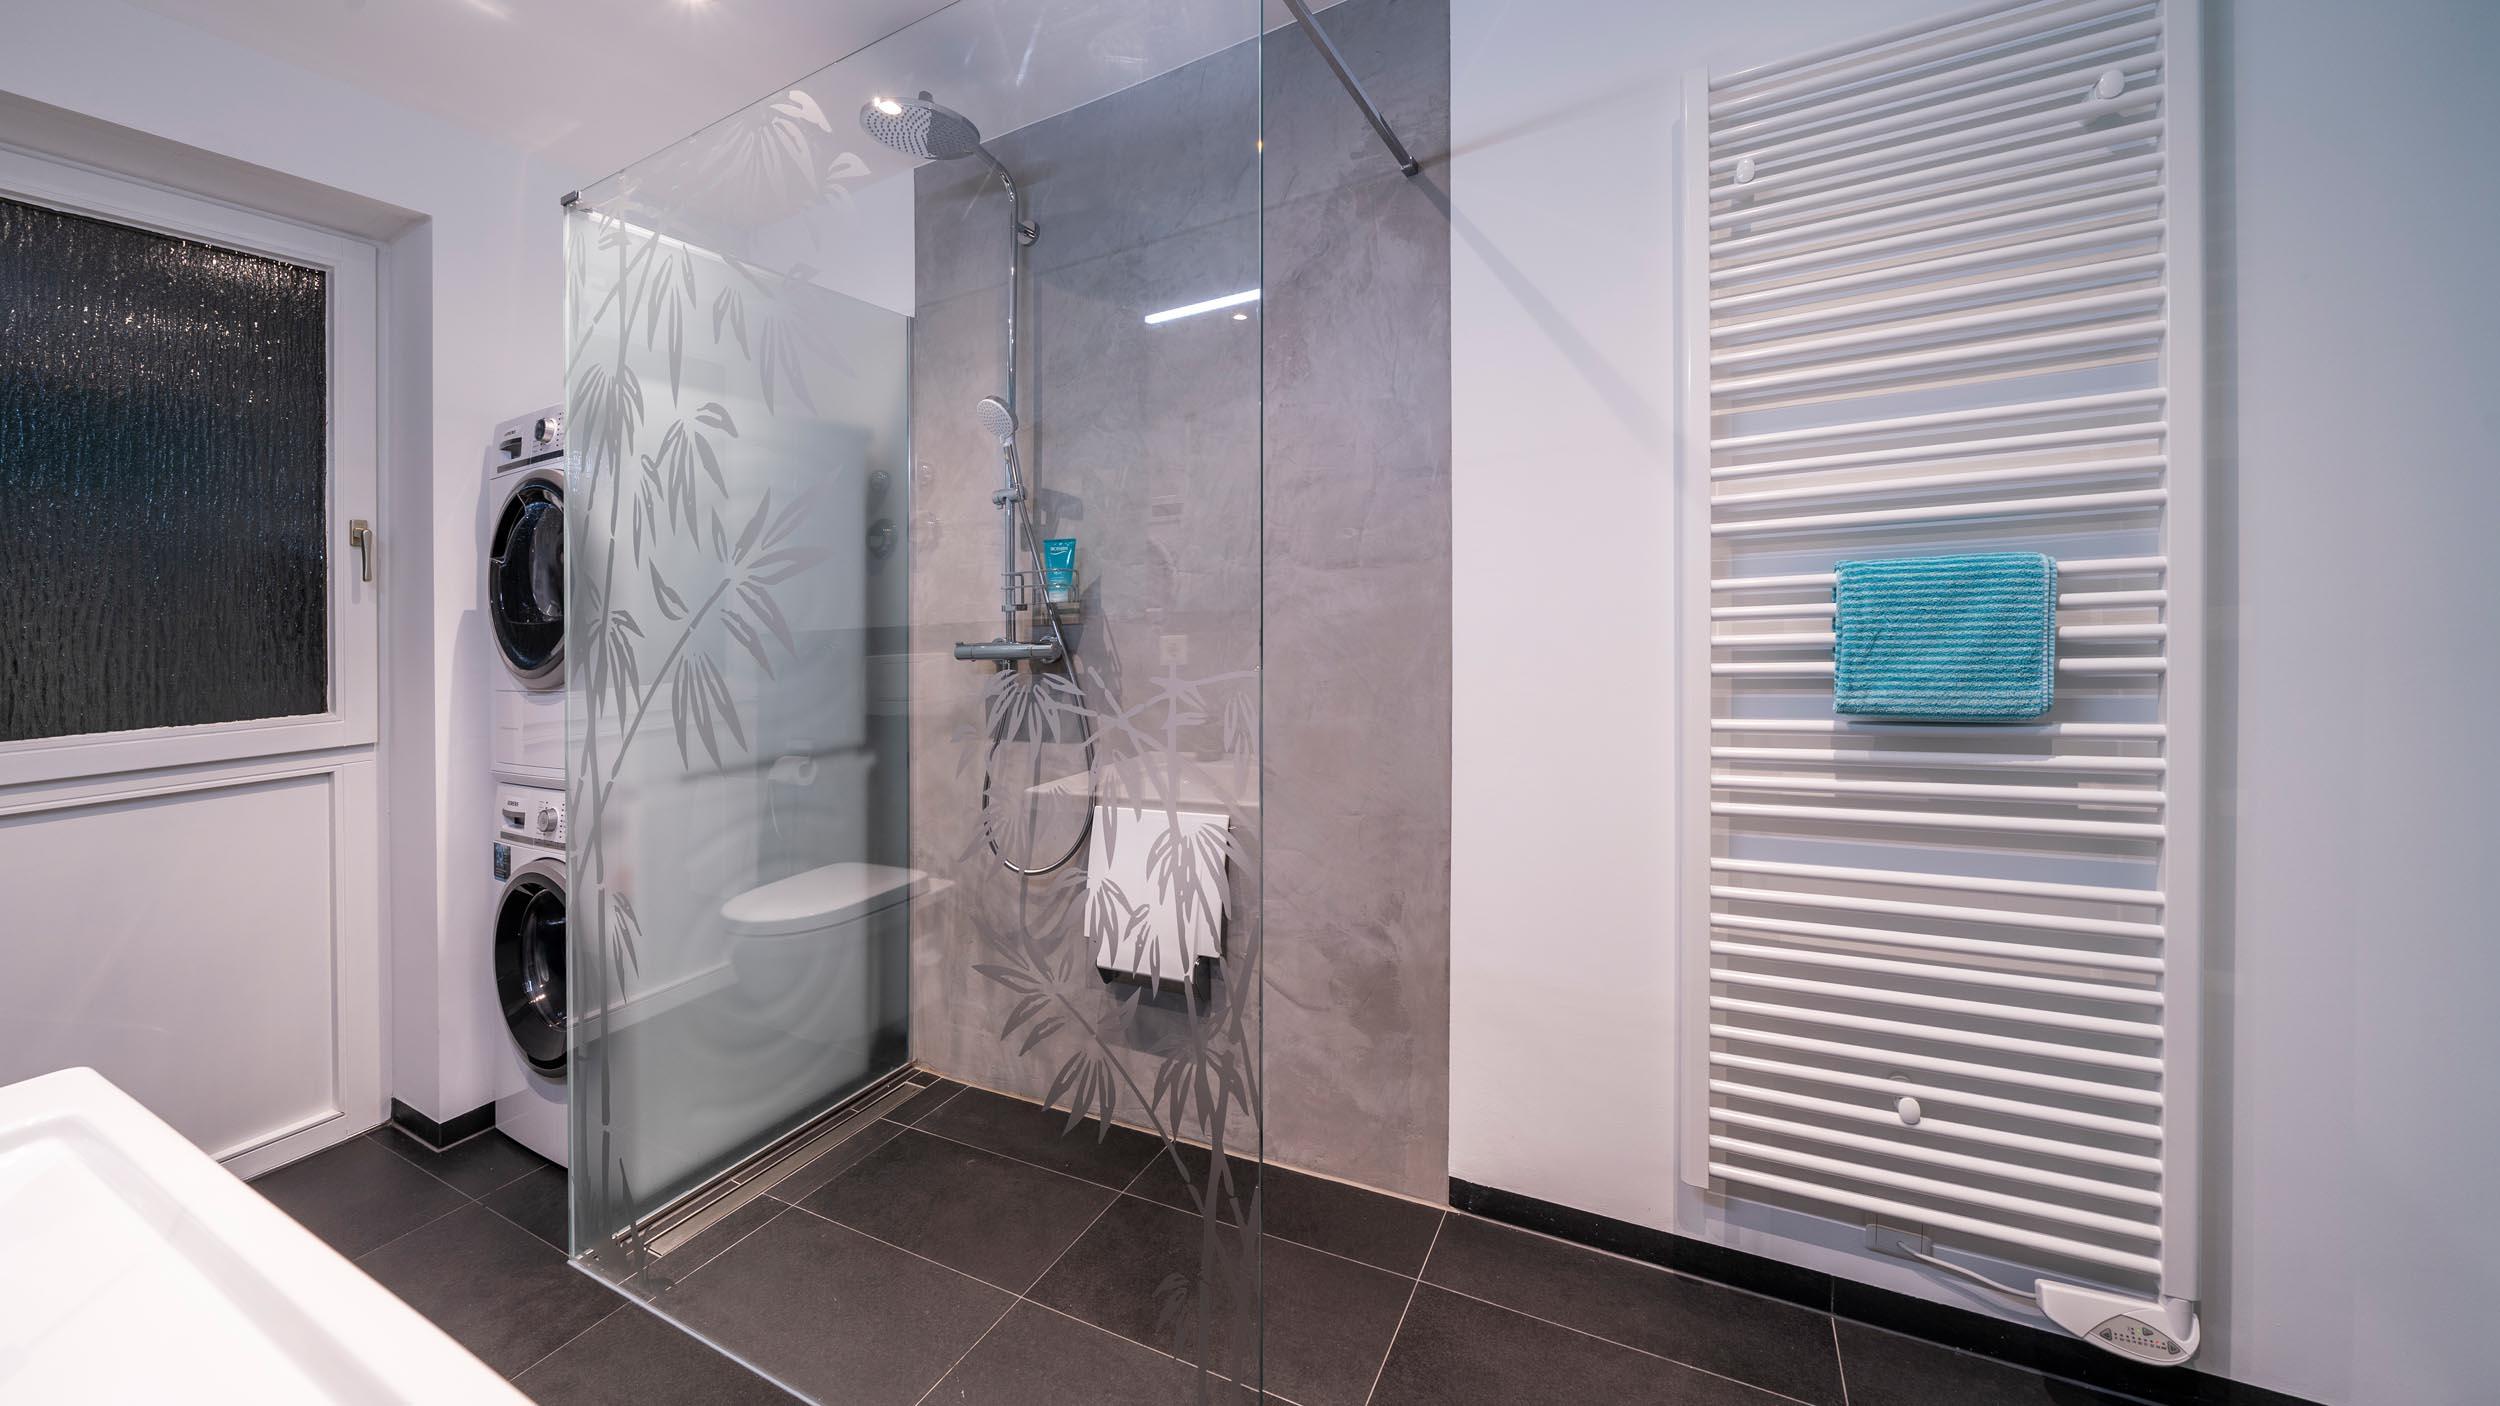 ebenerdiger Dusche komplett barrierefrei